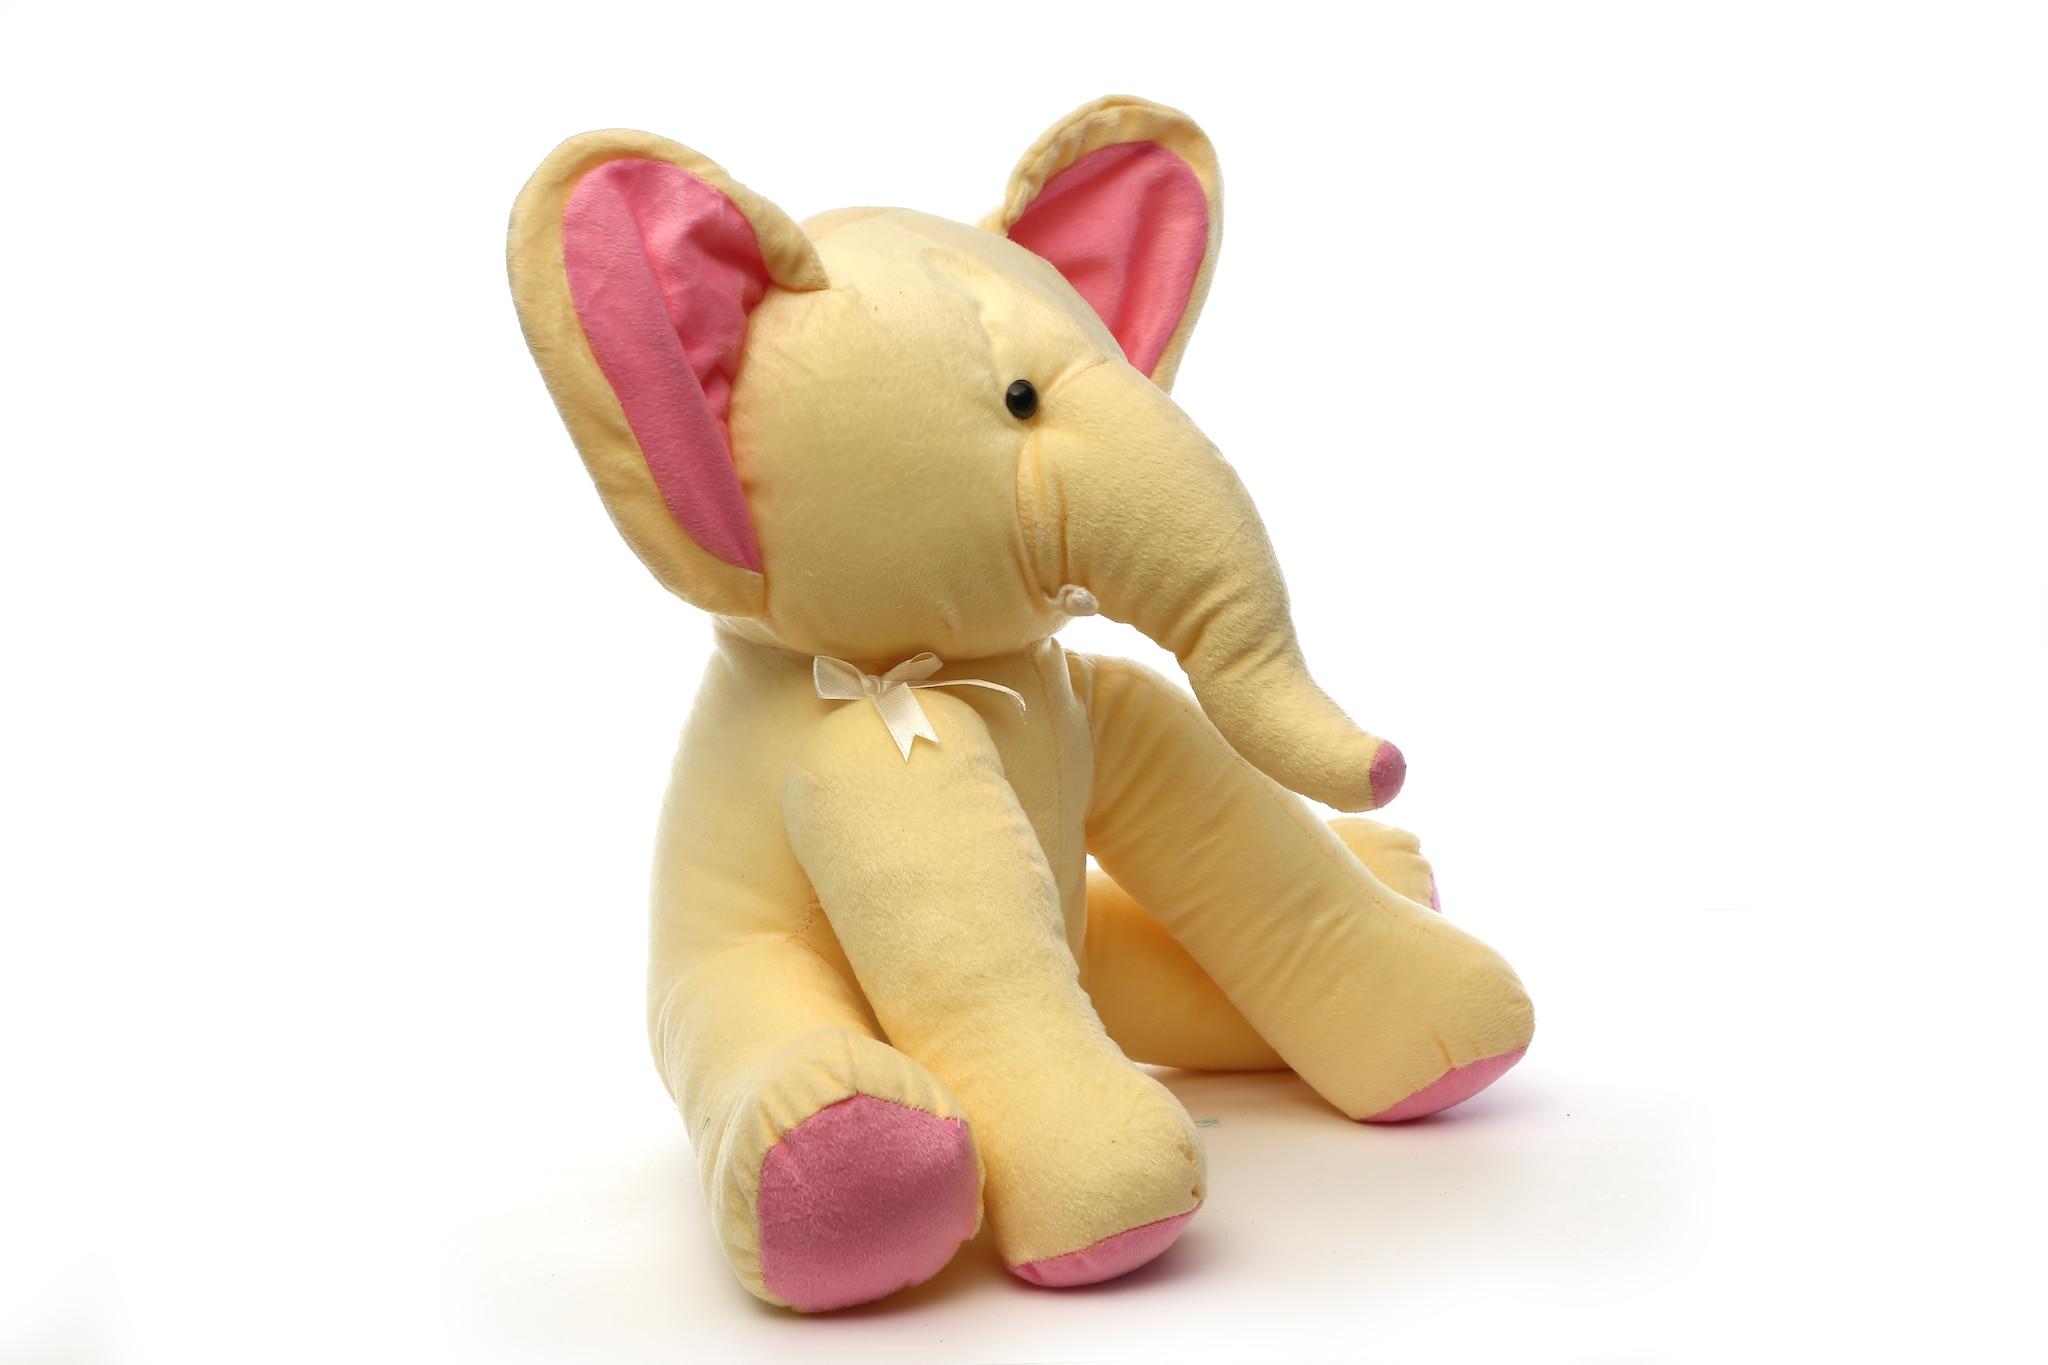 AT-1127-BEIGE SITTING ELEPHANT 45CM